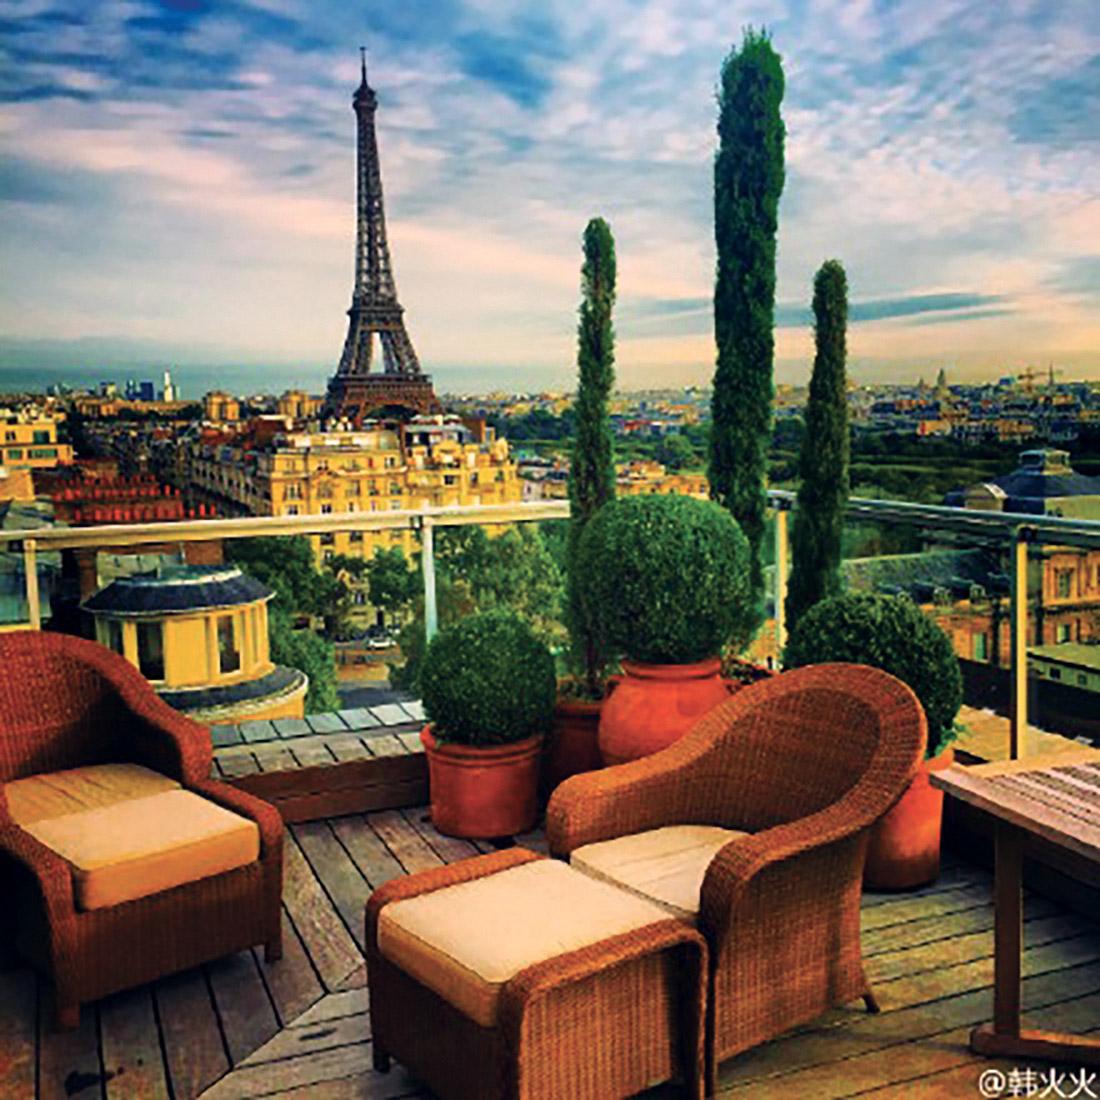 Picture taken in Paris